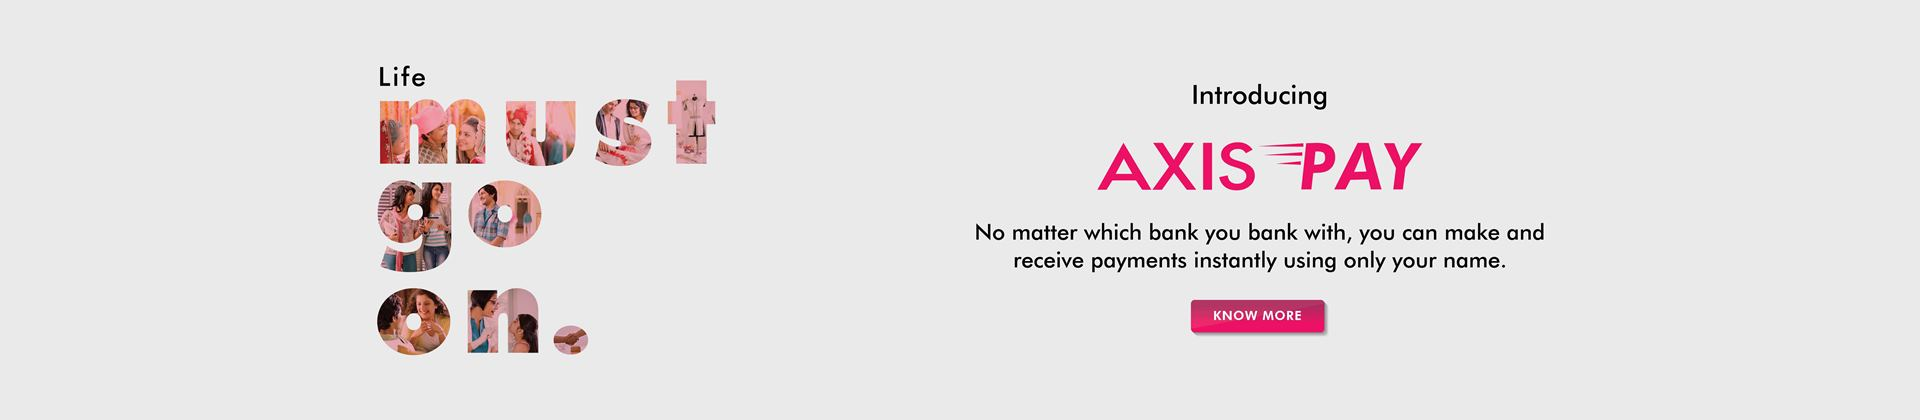 Desktop-banner-axis-pay